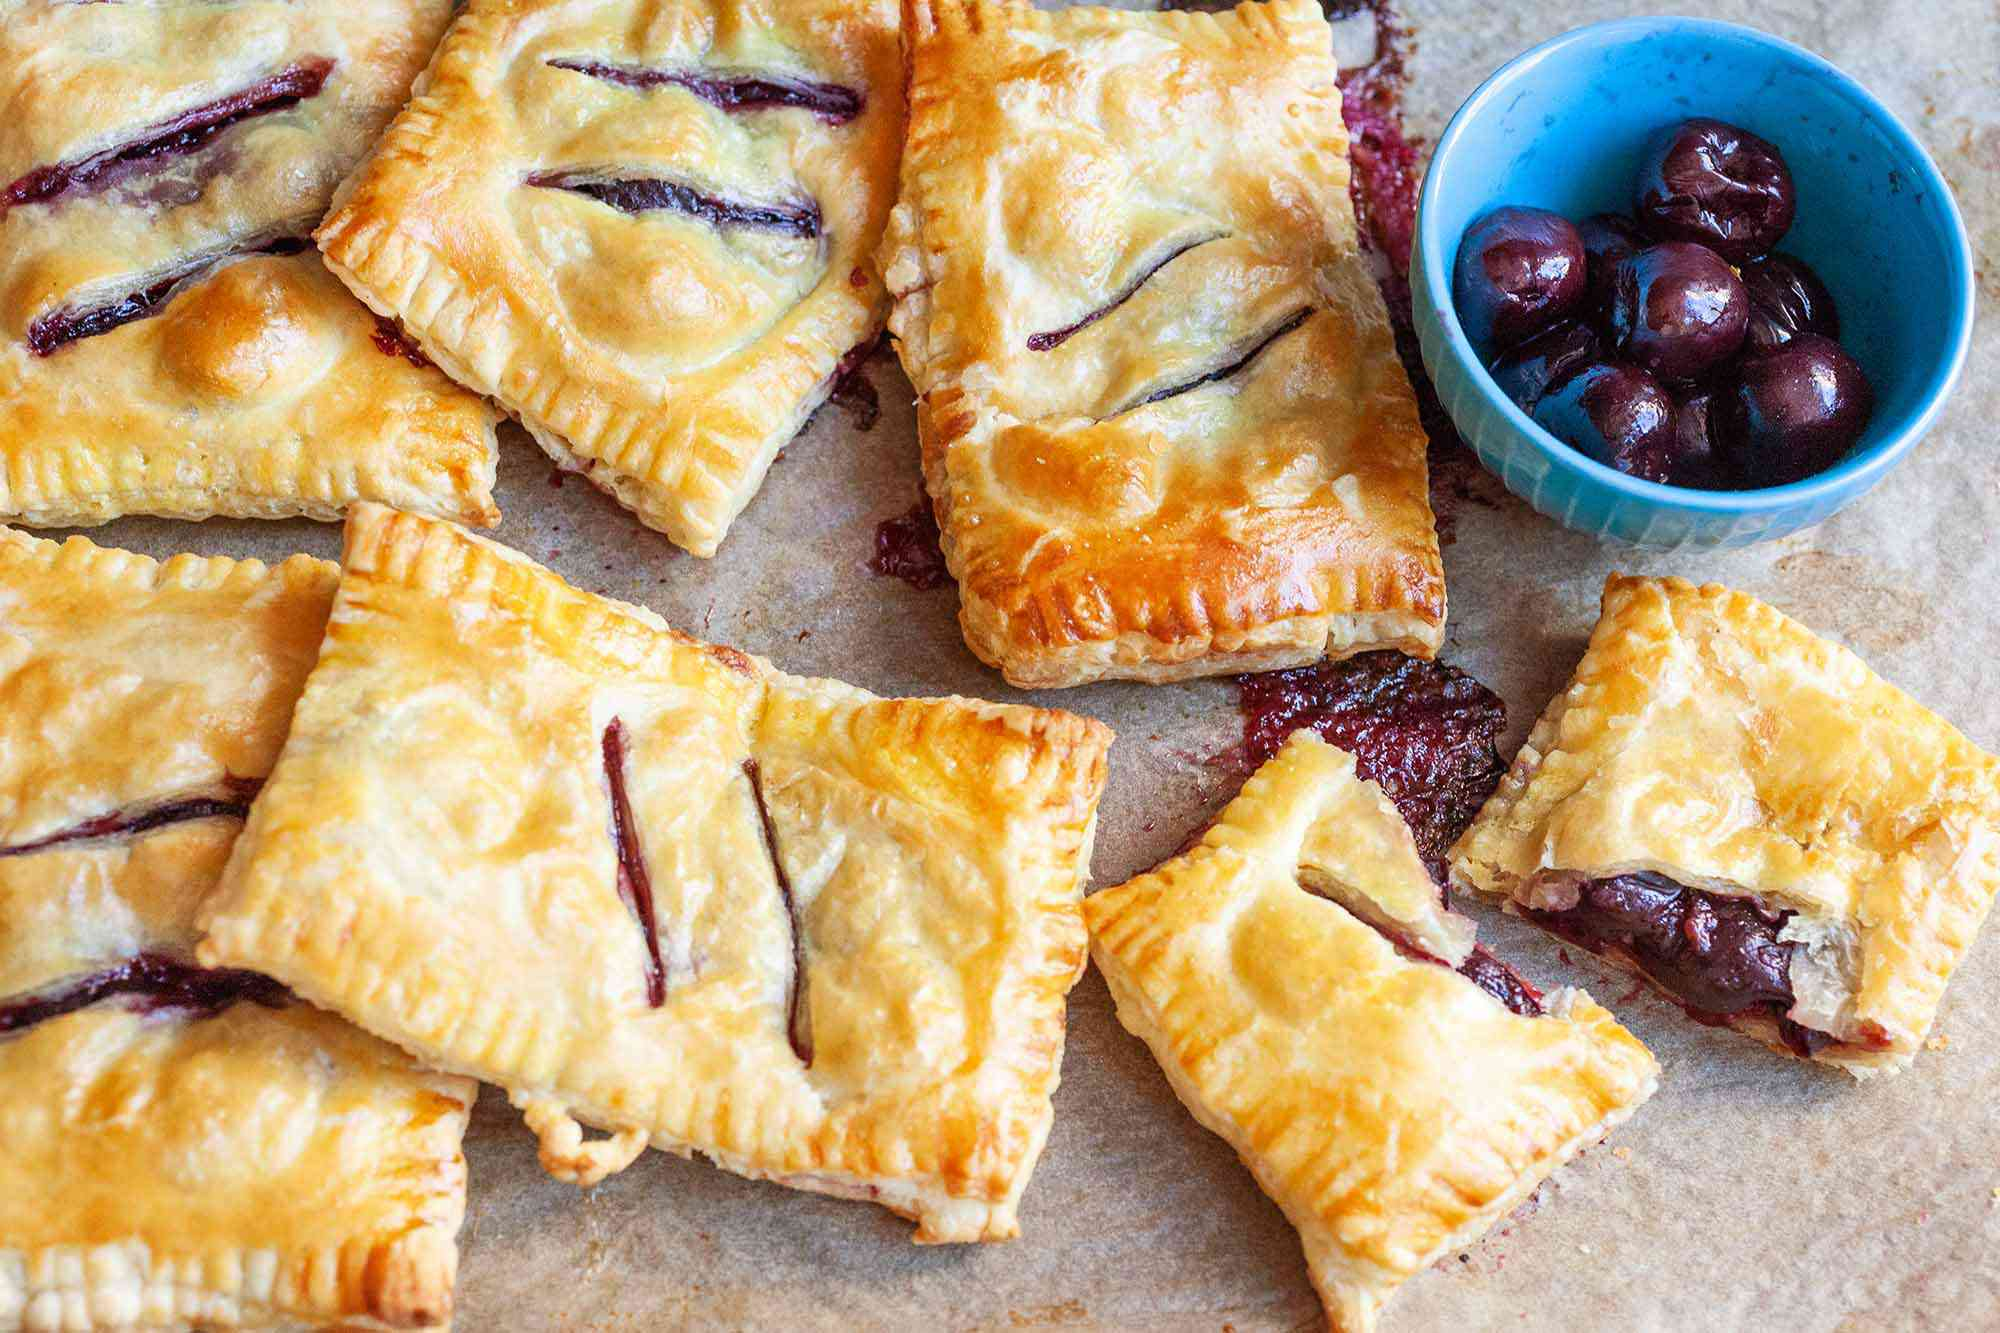 Cherry Hand Pies Recipe serve the pies